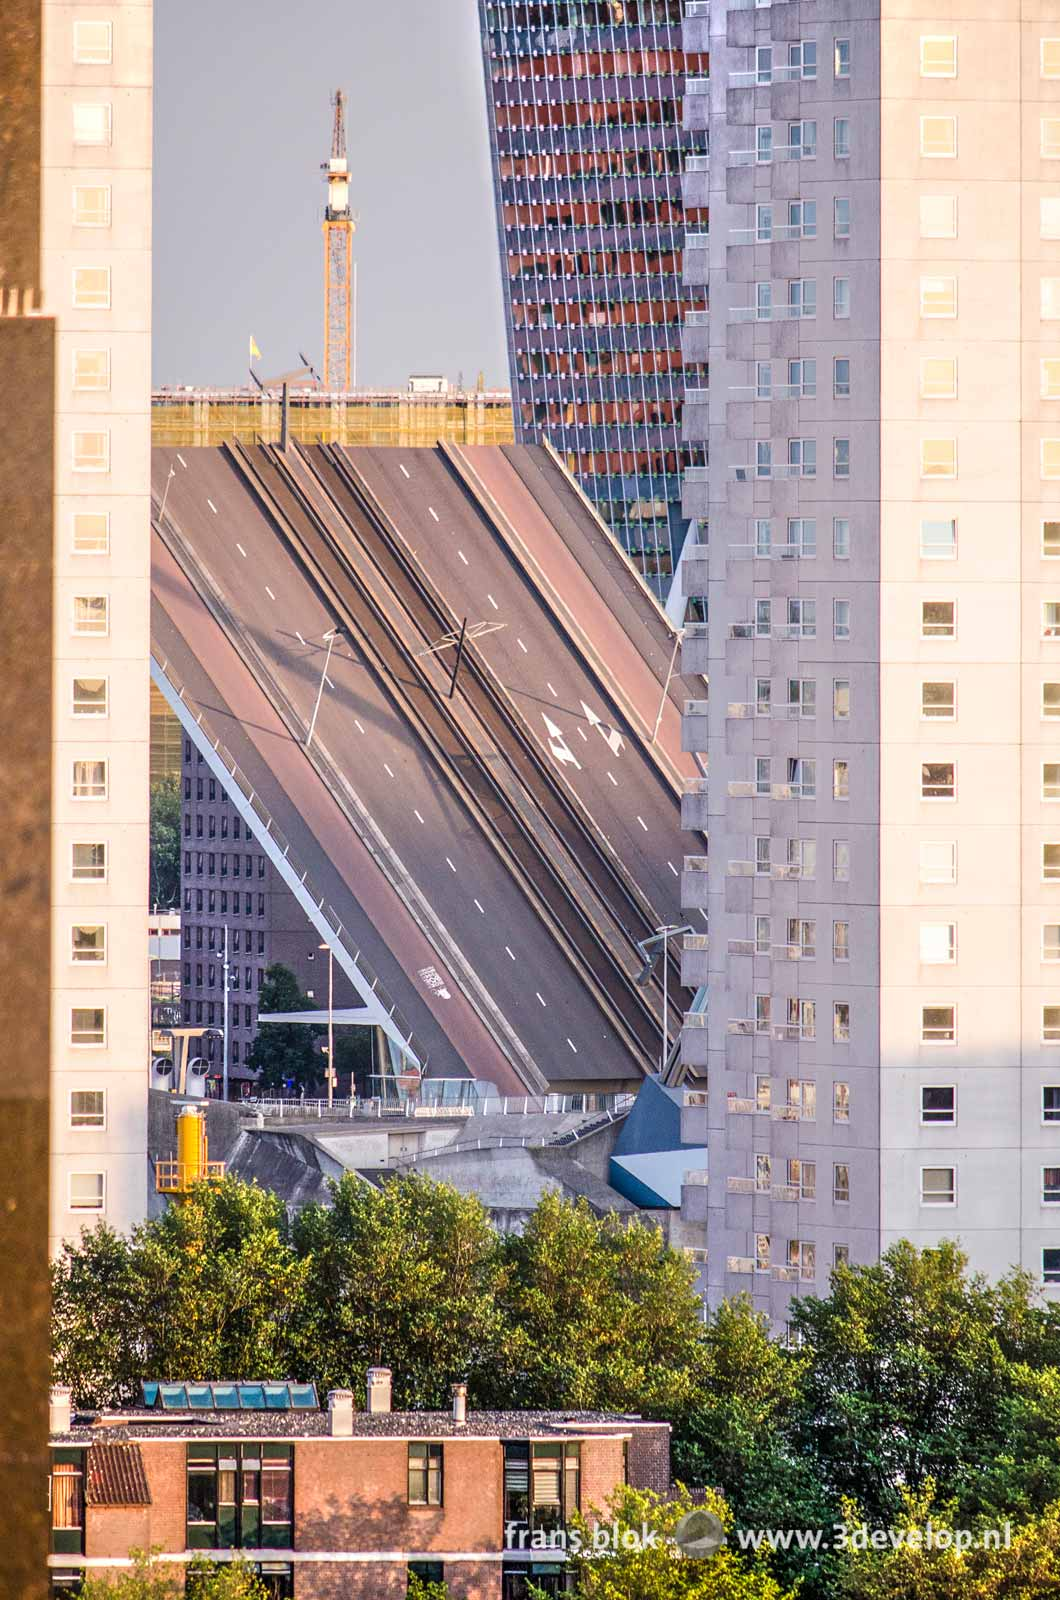 Vista from Erasmus House in Rotterdam towards the operable part of Erasmus Bridge